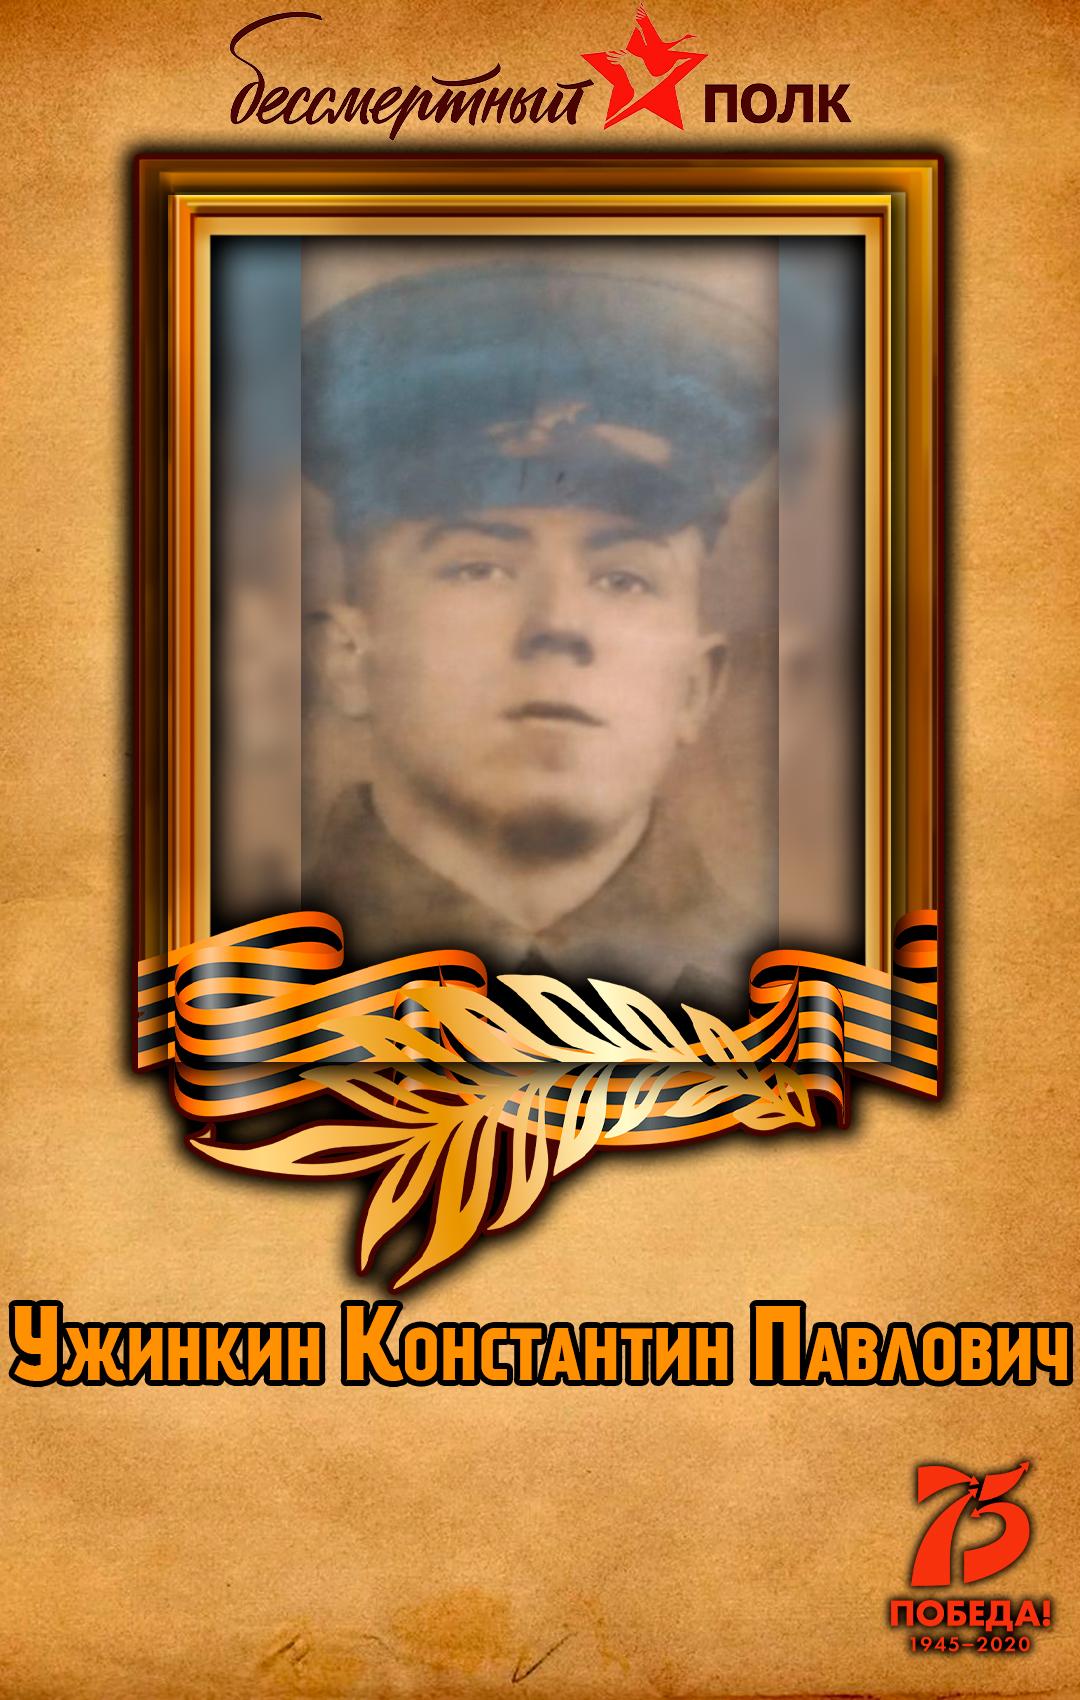 Ужинкин-Константин-Павлович